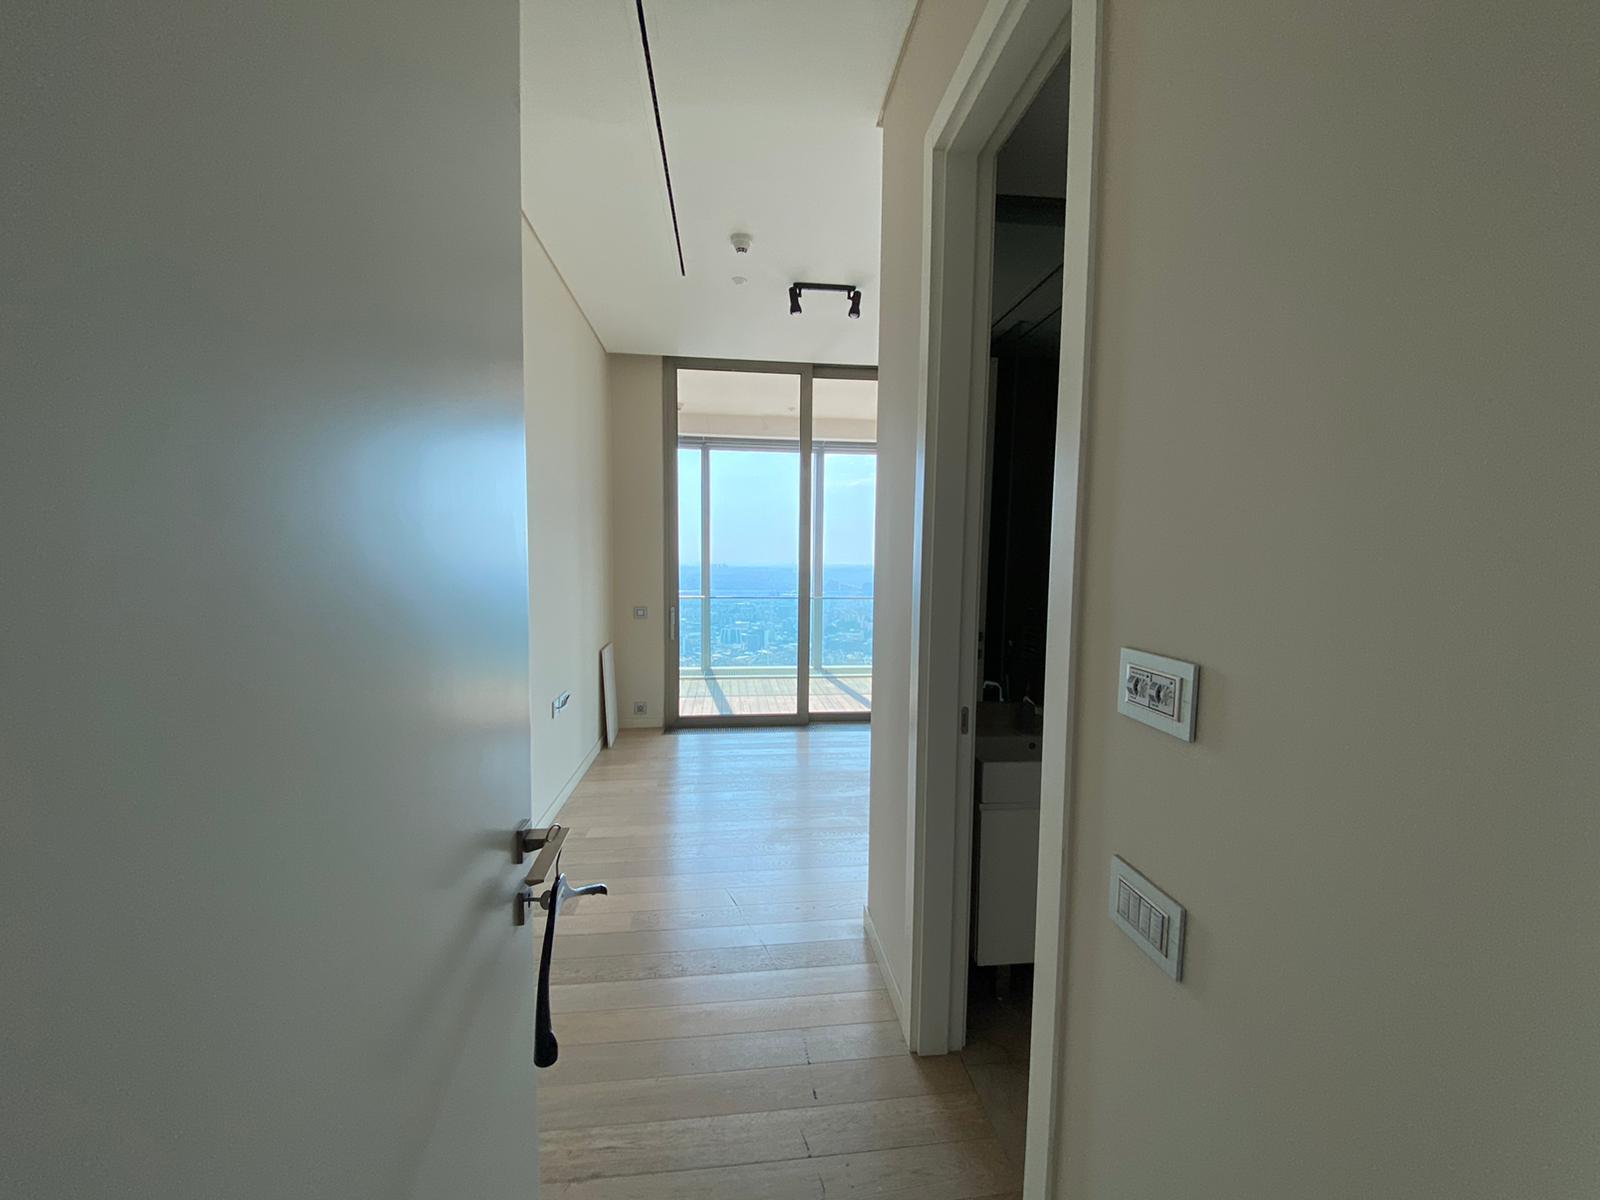 penthouse-istanbul-sapphire-tower-018-1.jpg